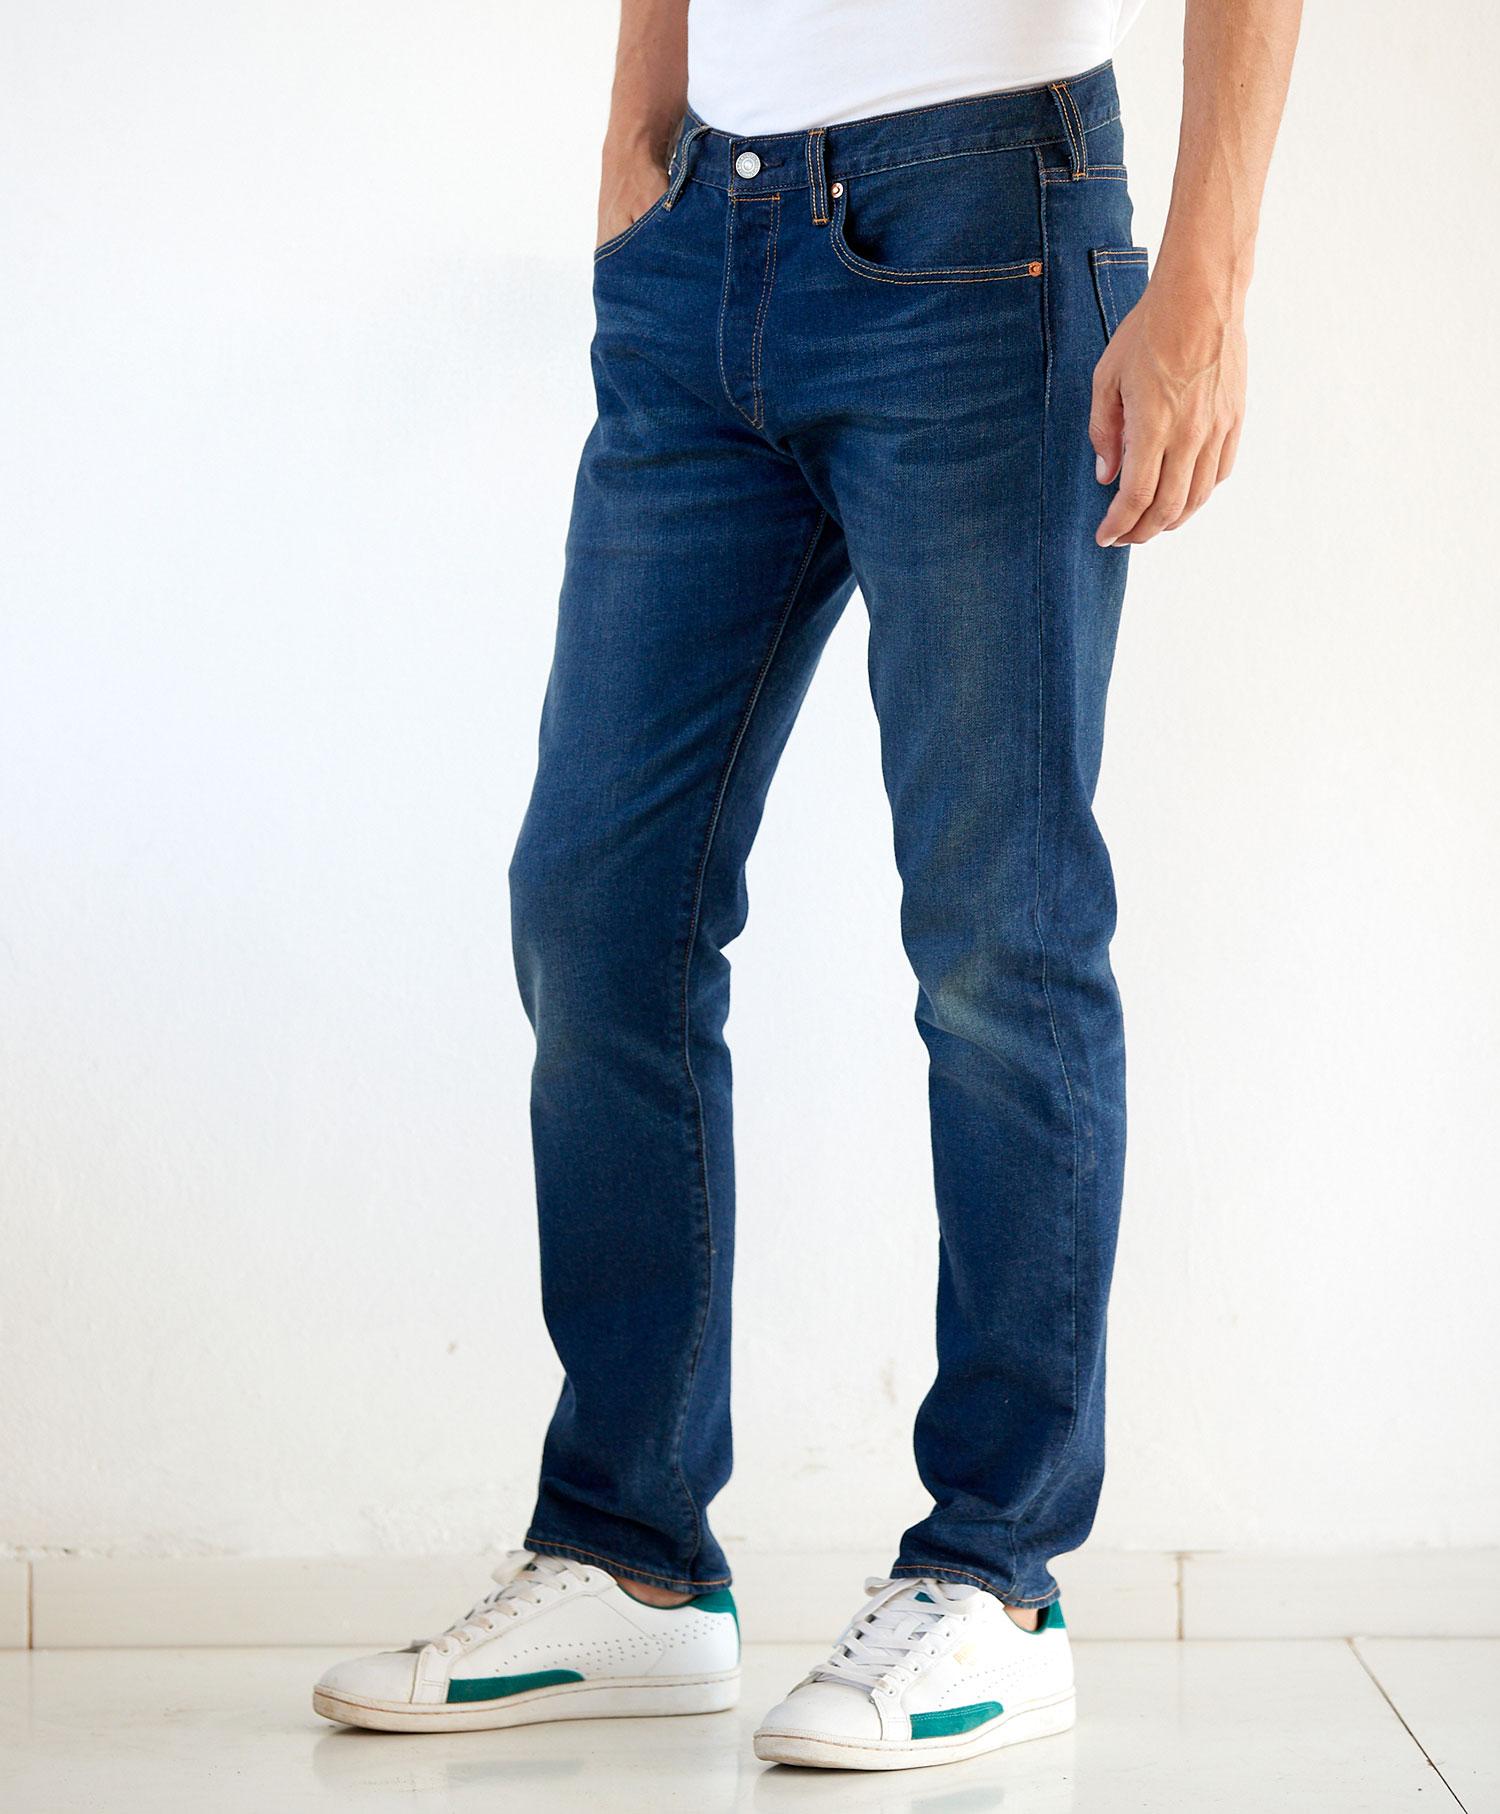 Levi's 501 Slim Taper